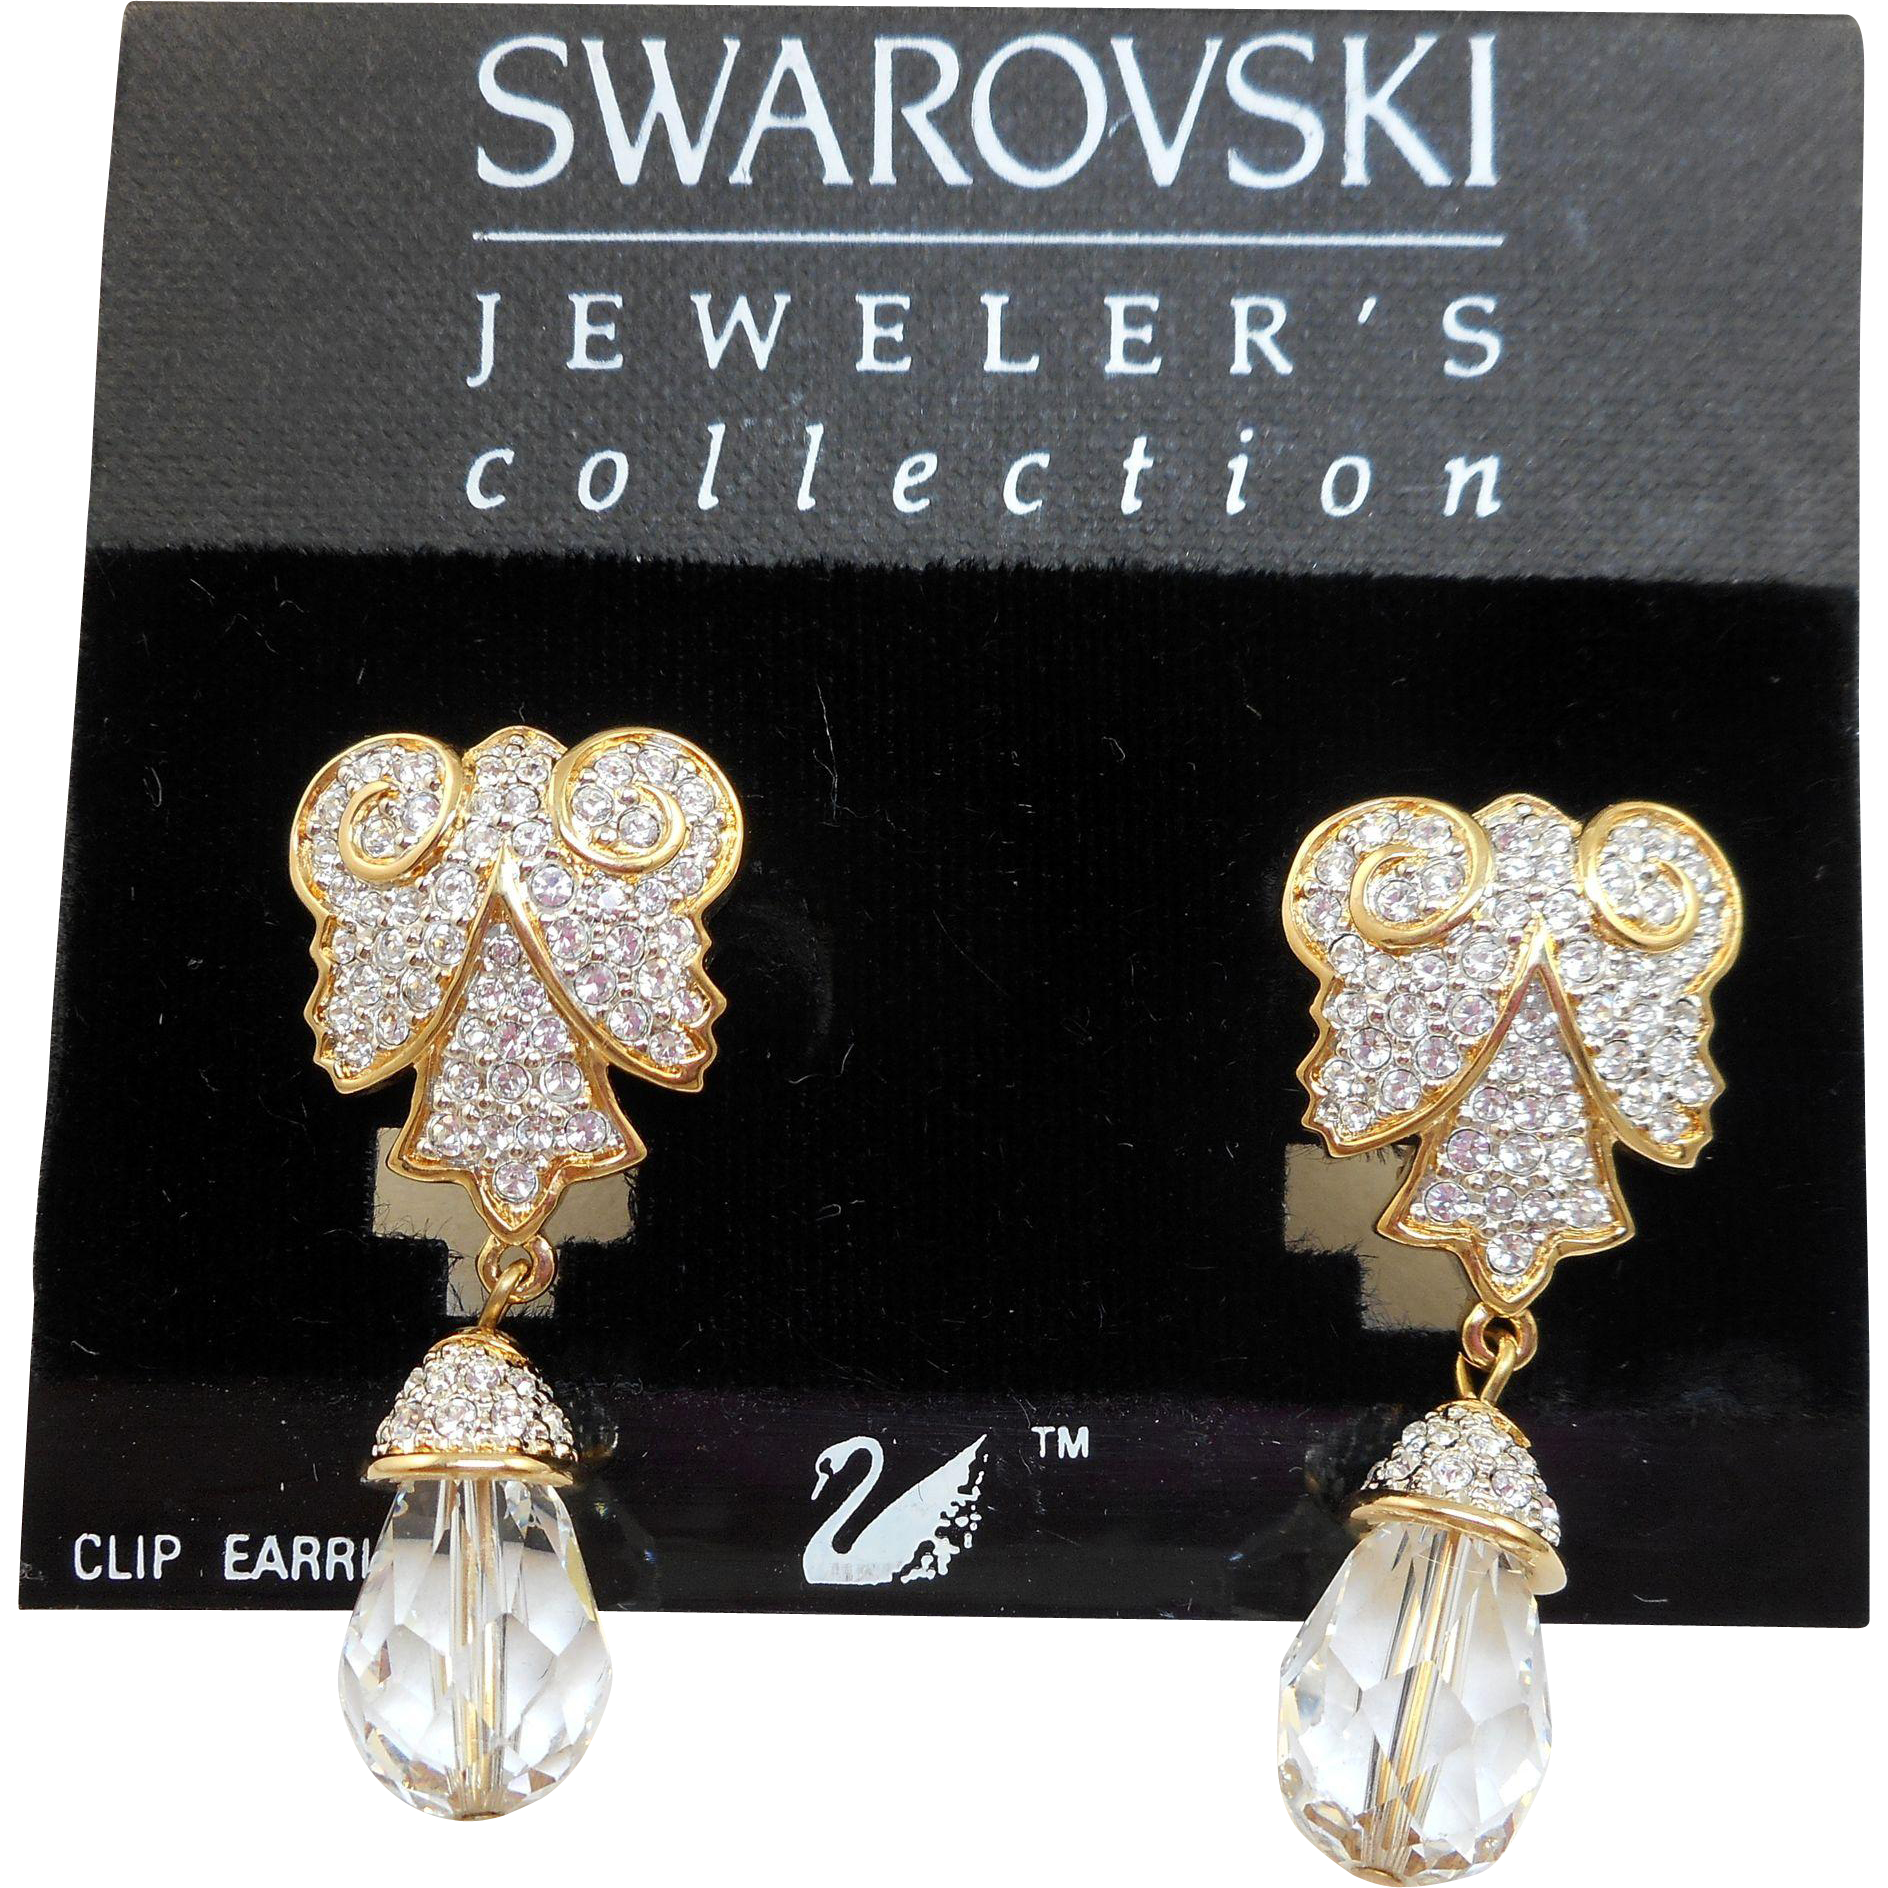 NOS Swarovski Crystal Dangle Earrings - MOC